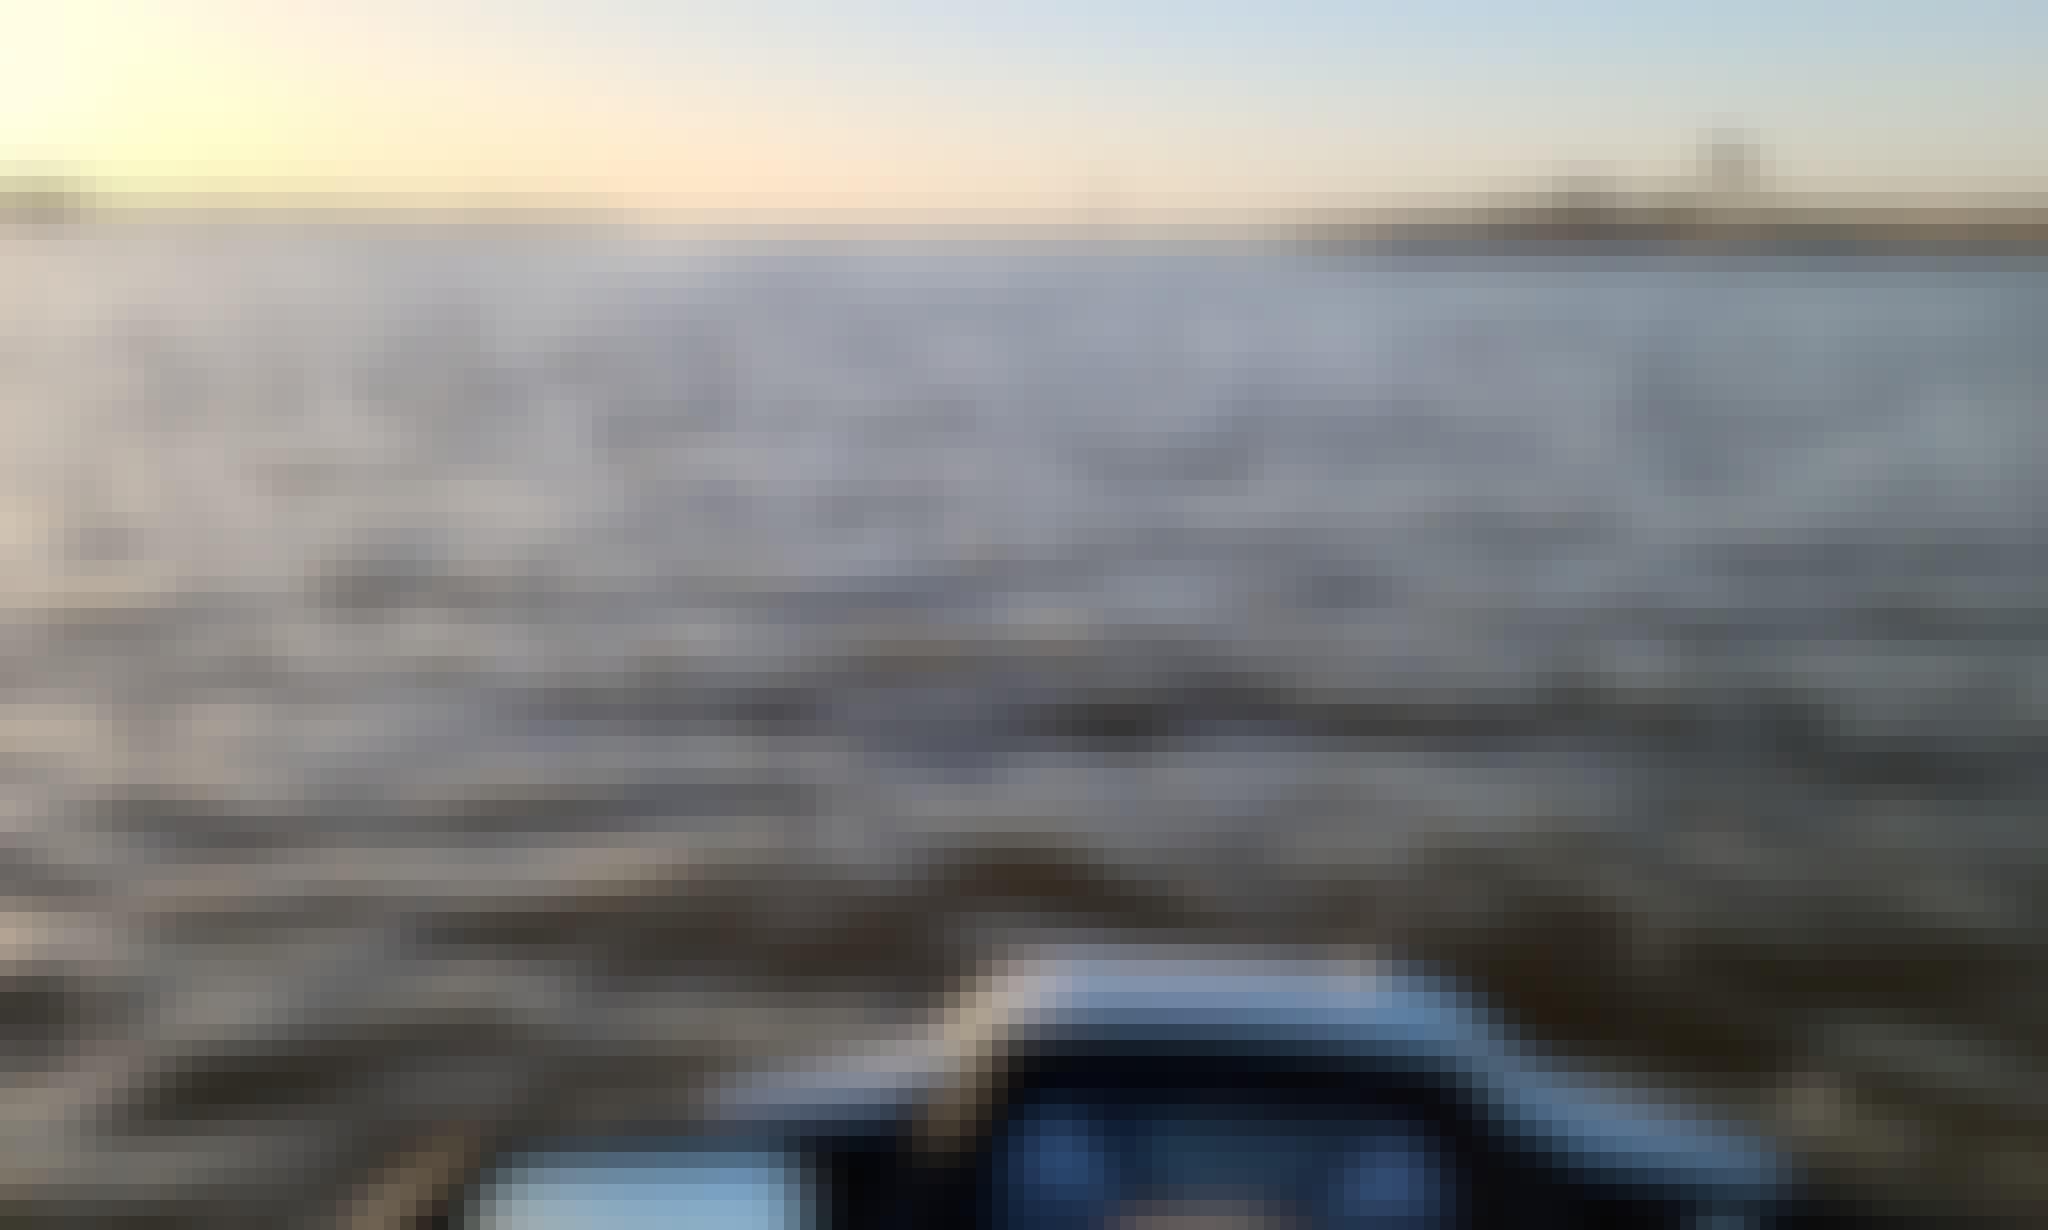 Yamaha Waverunner Jetski Rental on Clear Lake Texas